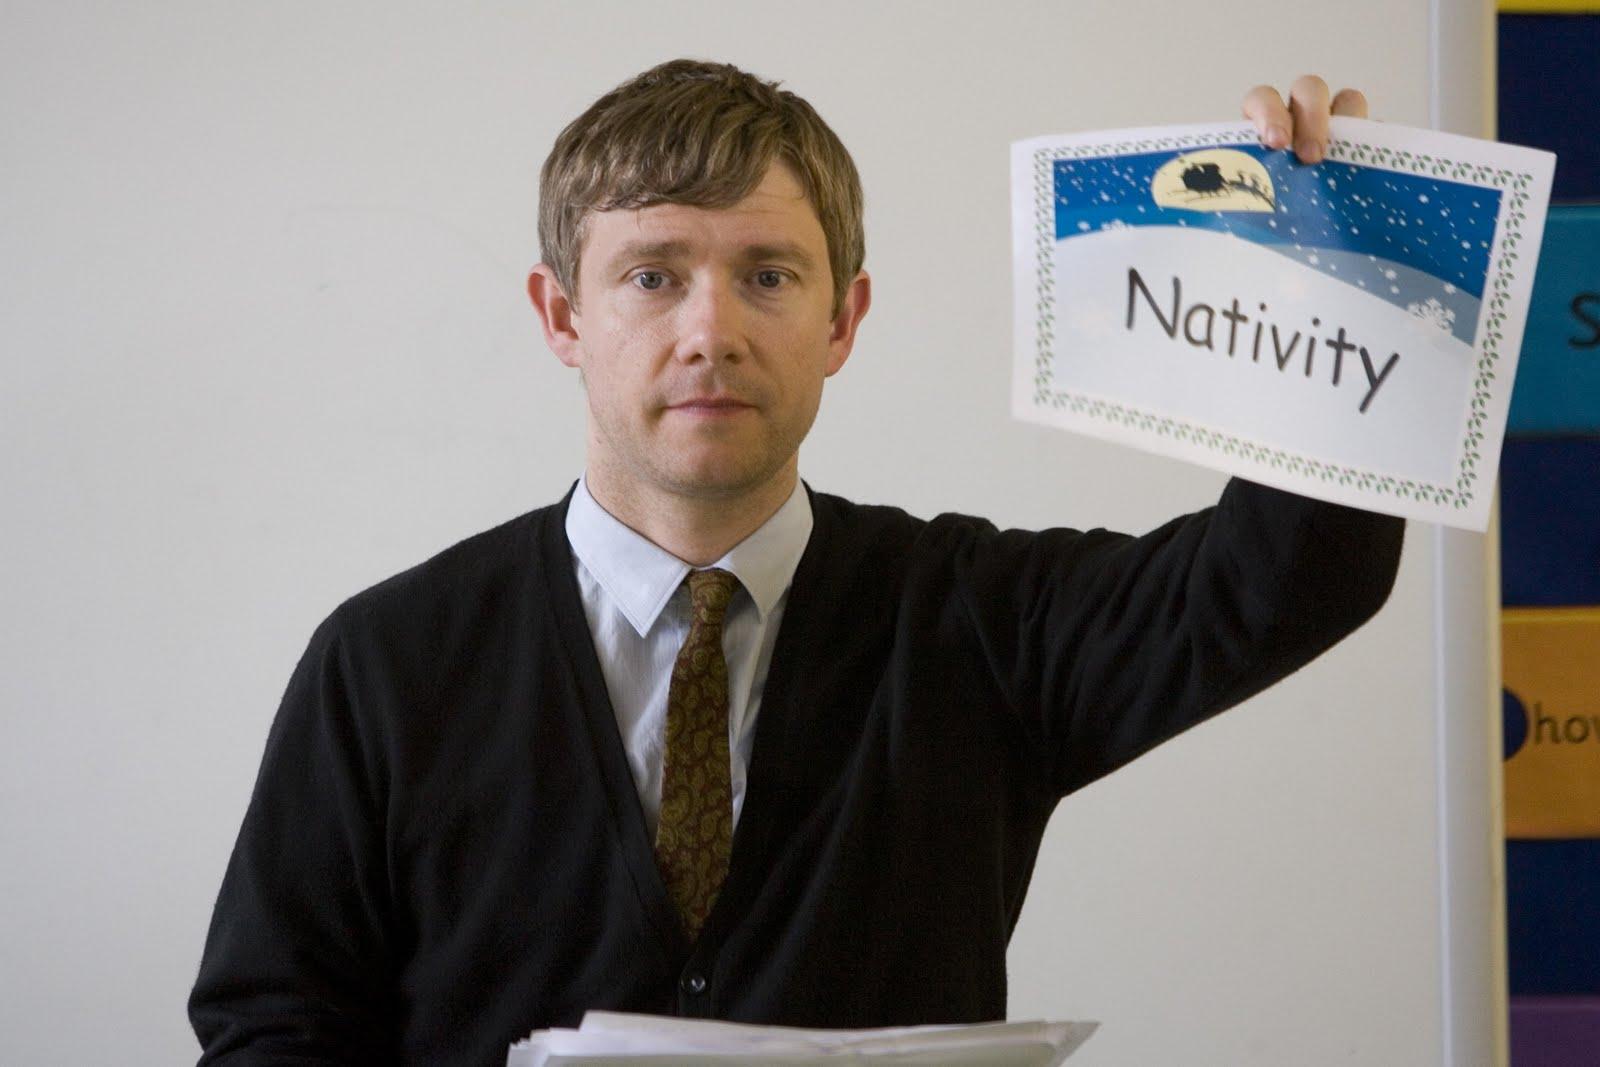 MartinNativity